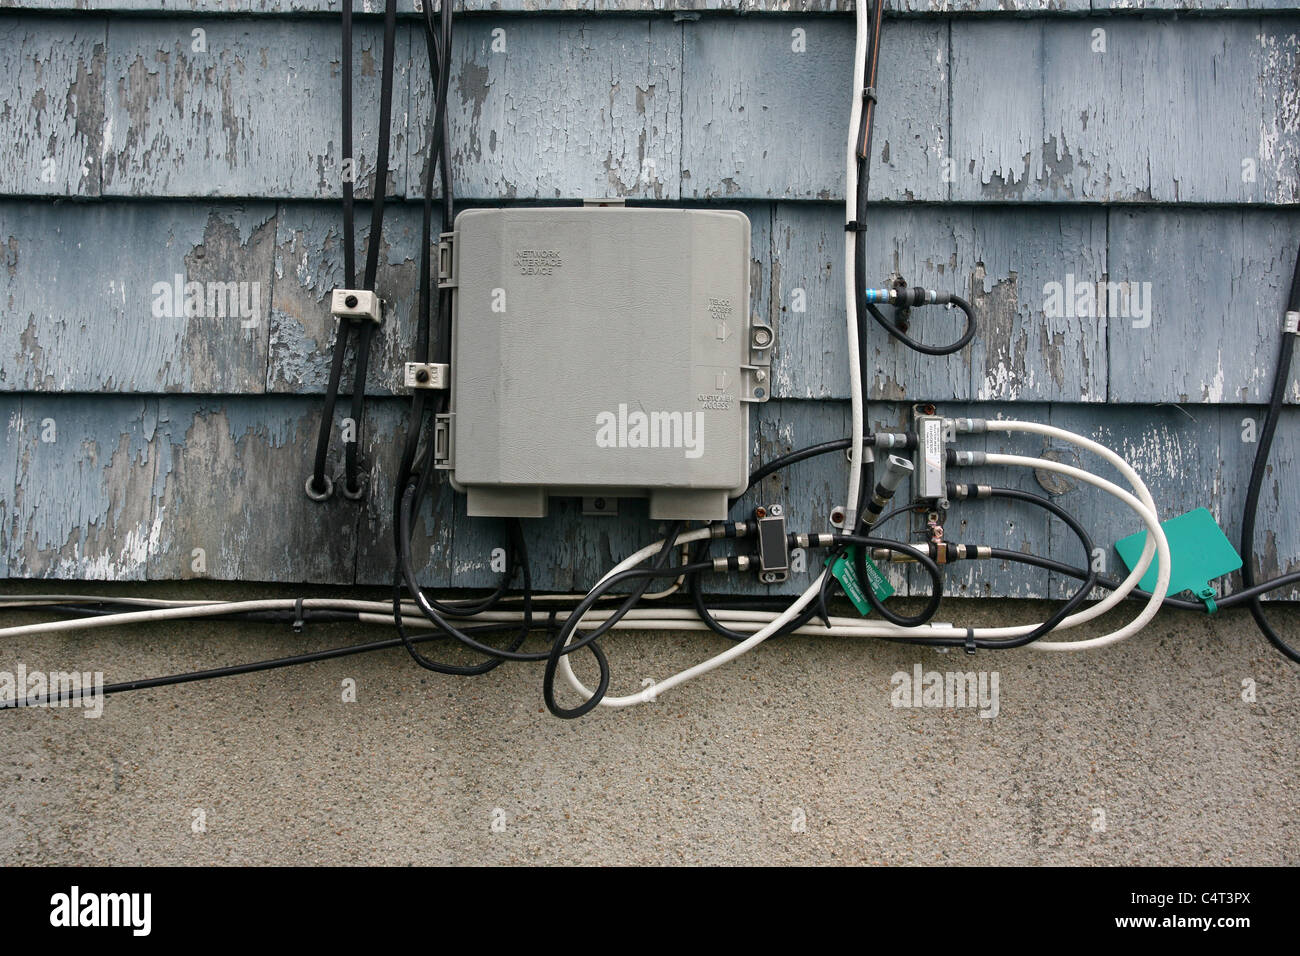 Schön E Förmiger Elektrischer Draht Fotos - Schaltplan Serie Circuit ...